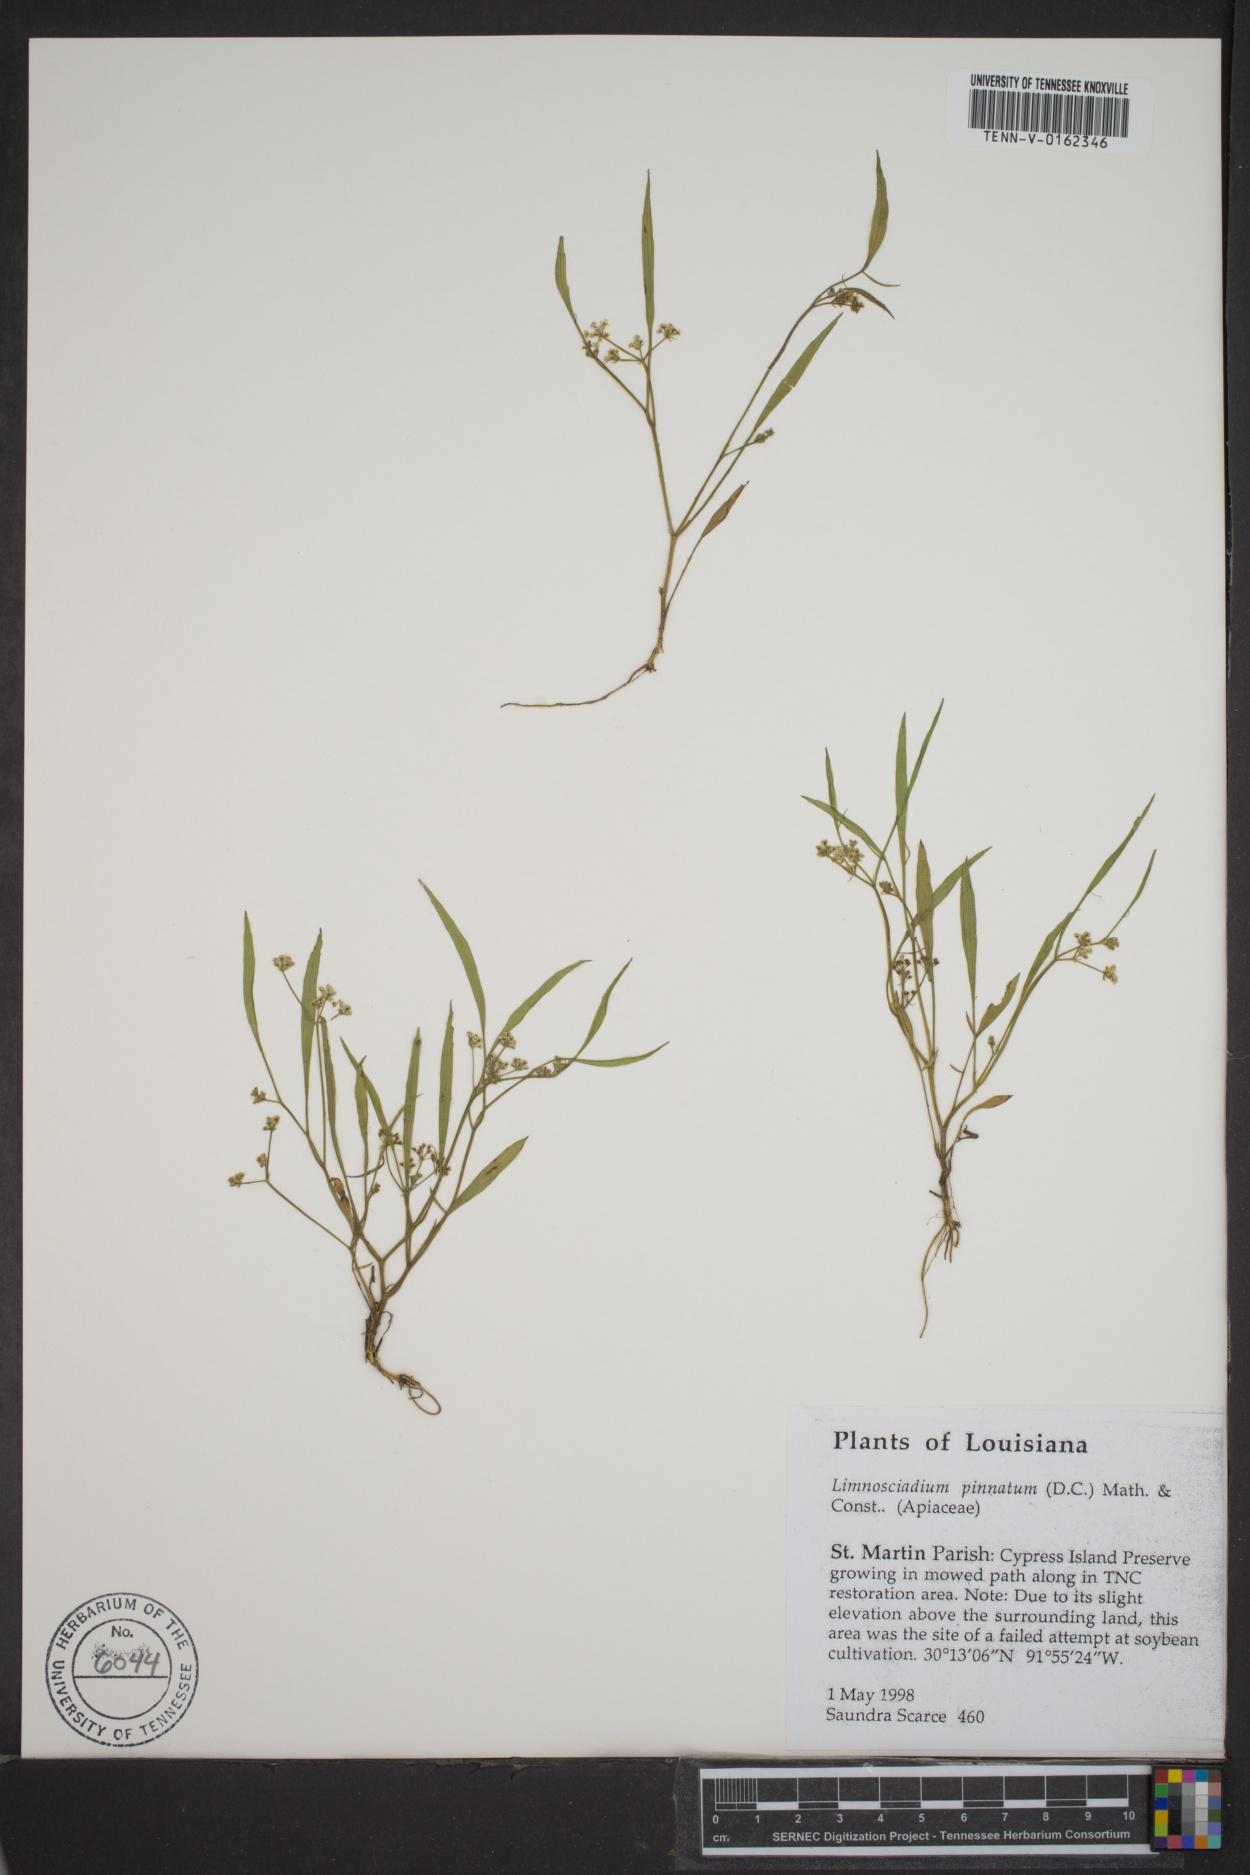 Limnosciadium image